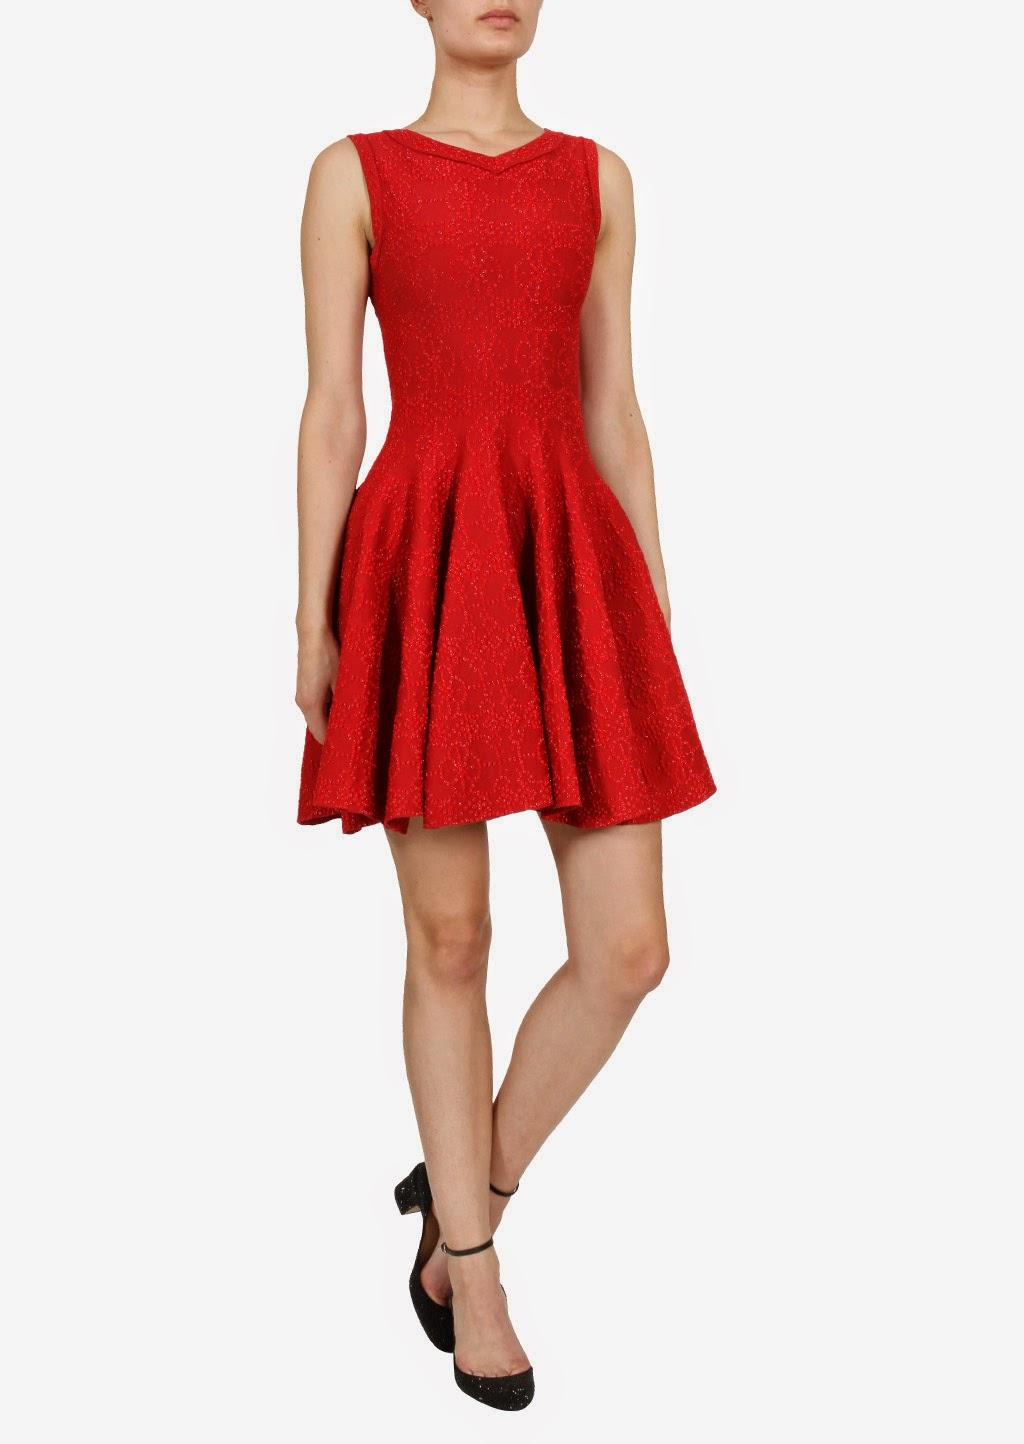 maidens blush la petite robe rouge. Black Bedroom Furniture Sets. Home Design Ideas